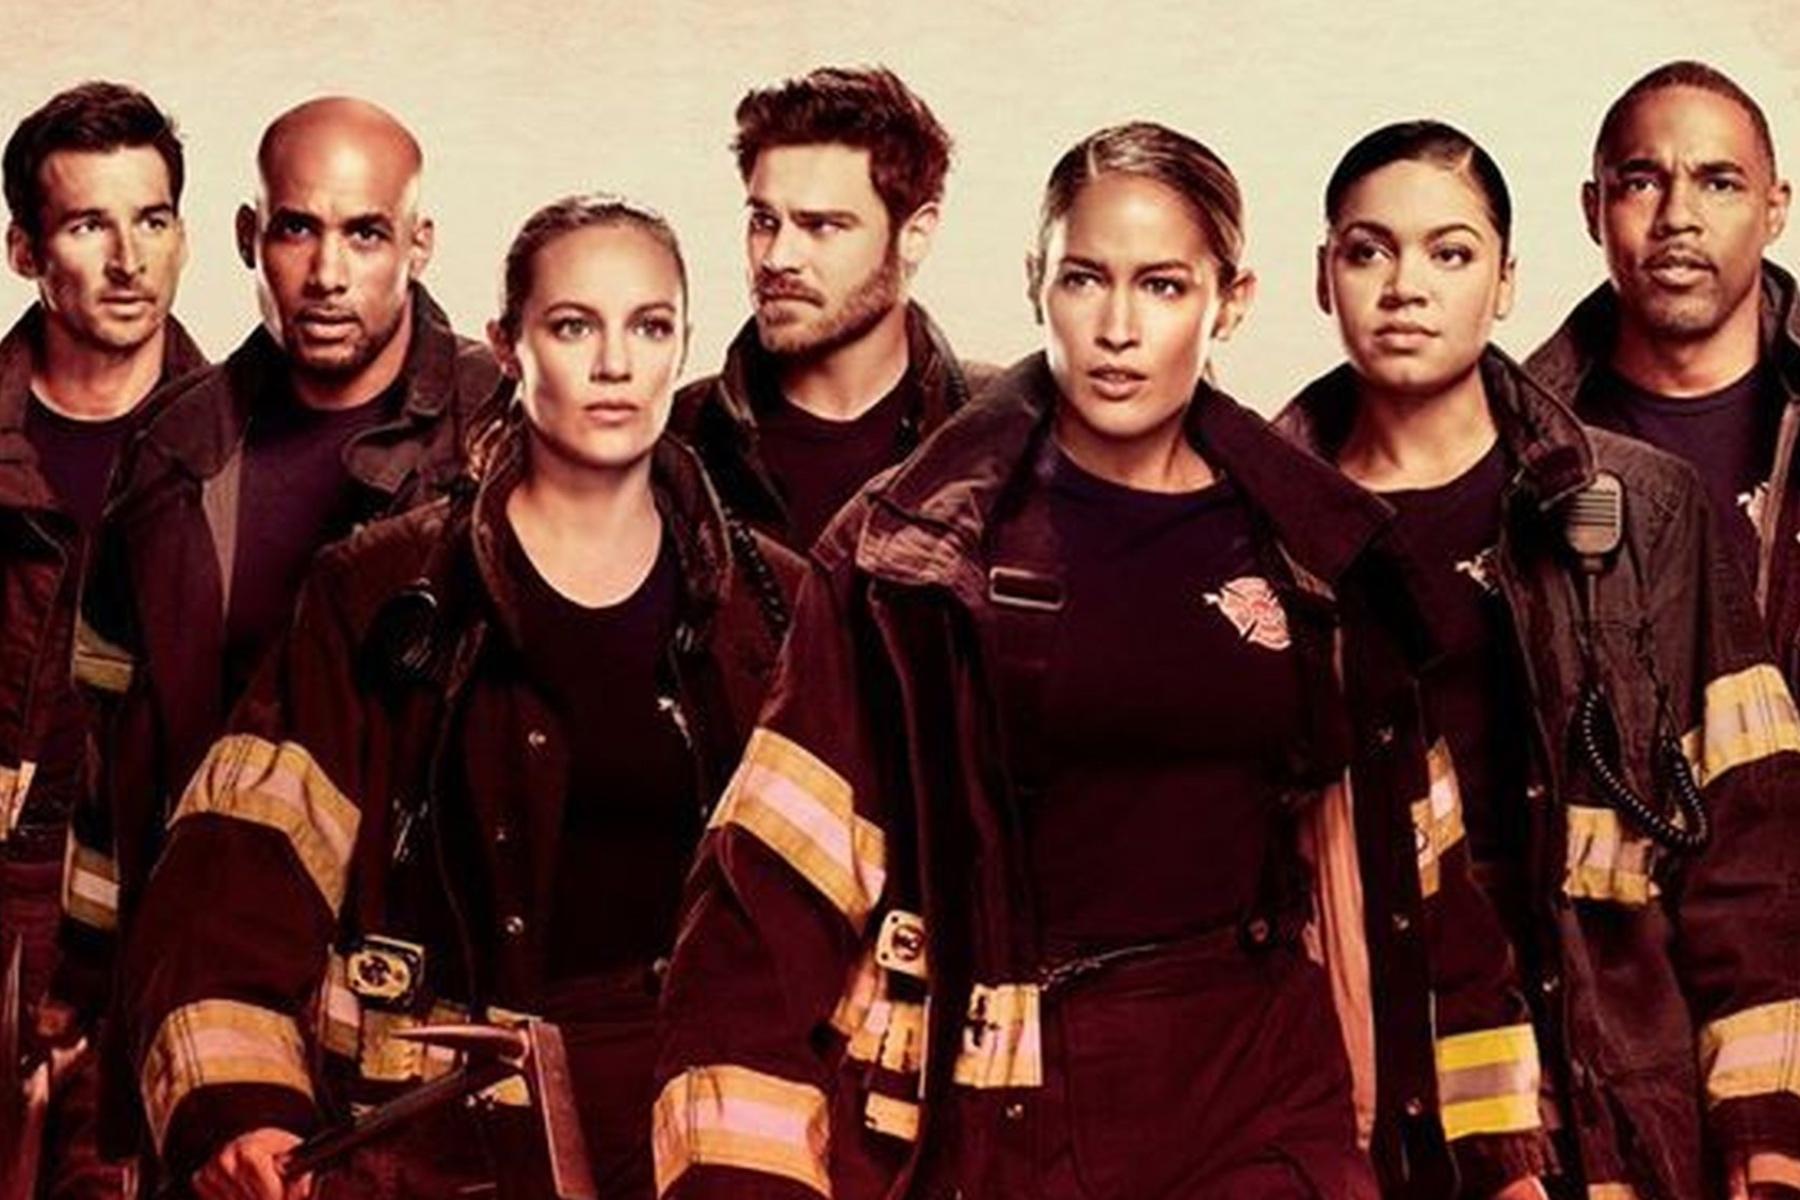 Geheimtipp Hamburg Serien Guide Juli Greys Anatomy Seattle Firefighters Disney plus 04 – ©Disney+